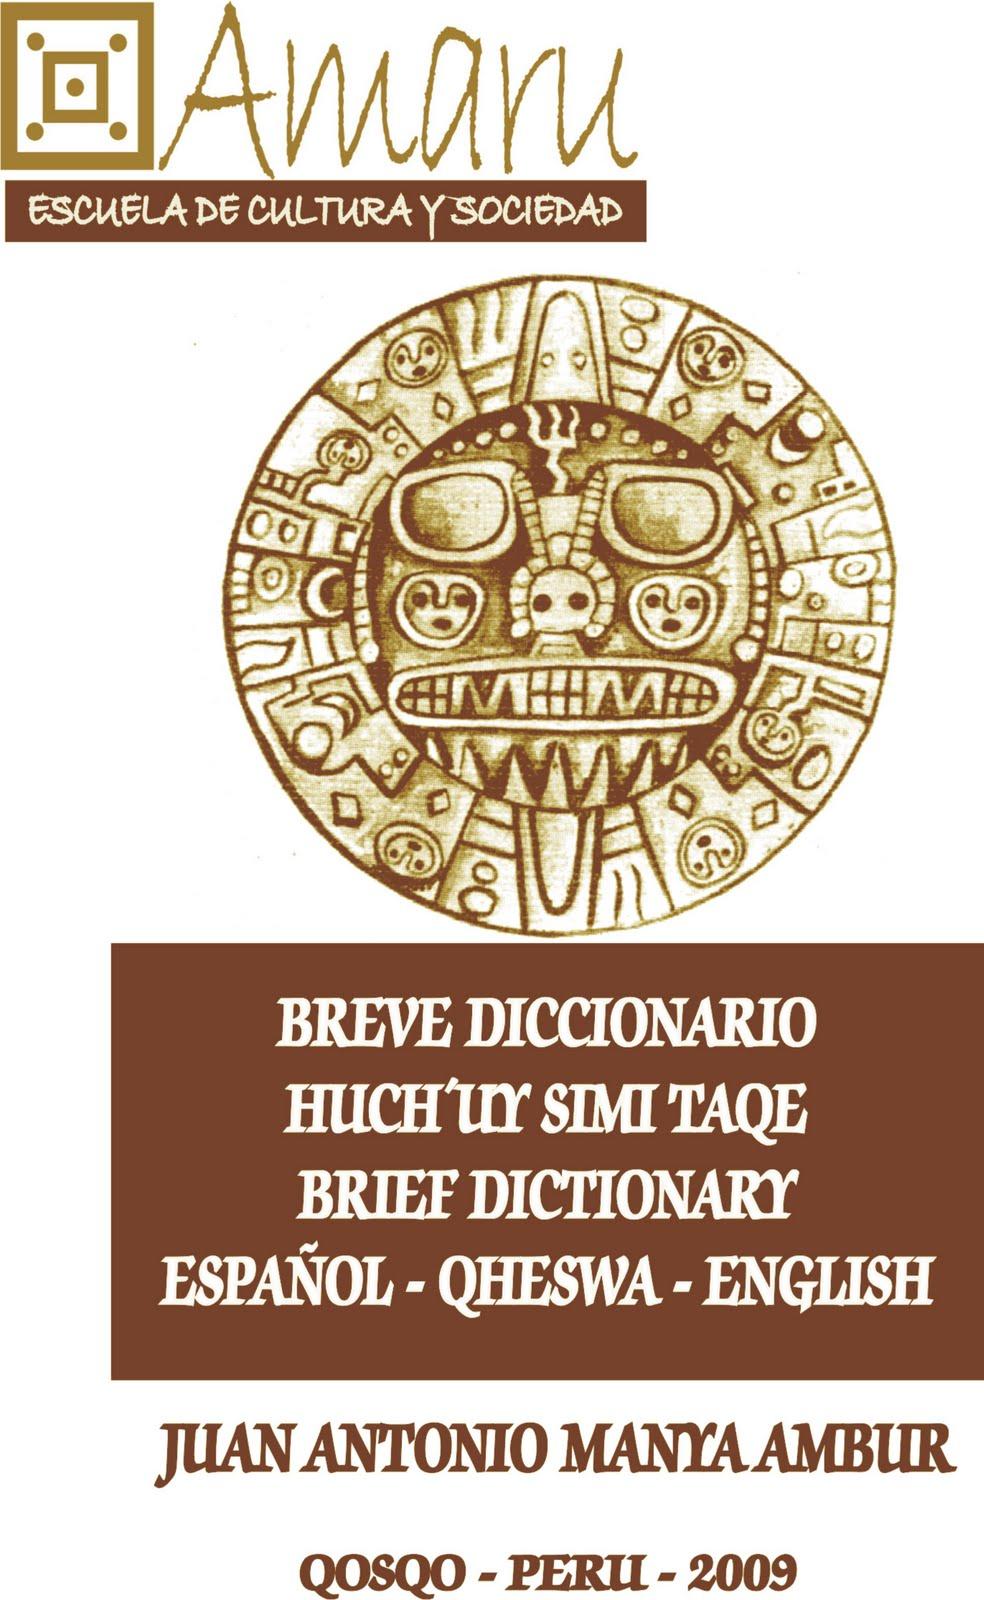 BREVE DICCIONARIO ESPAÑOL - QHESWA - ENGLISH